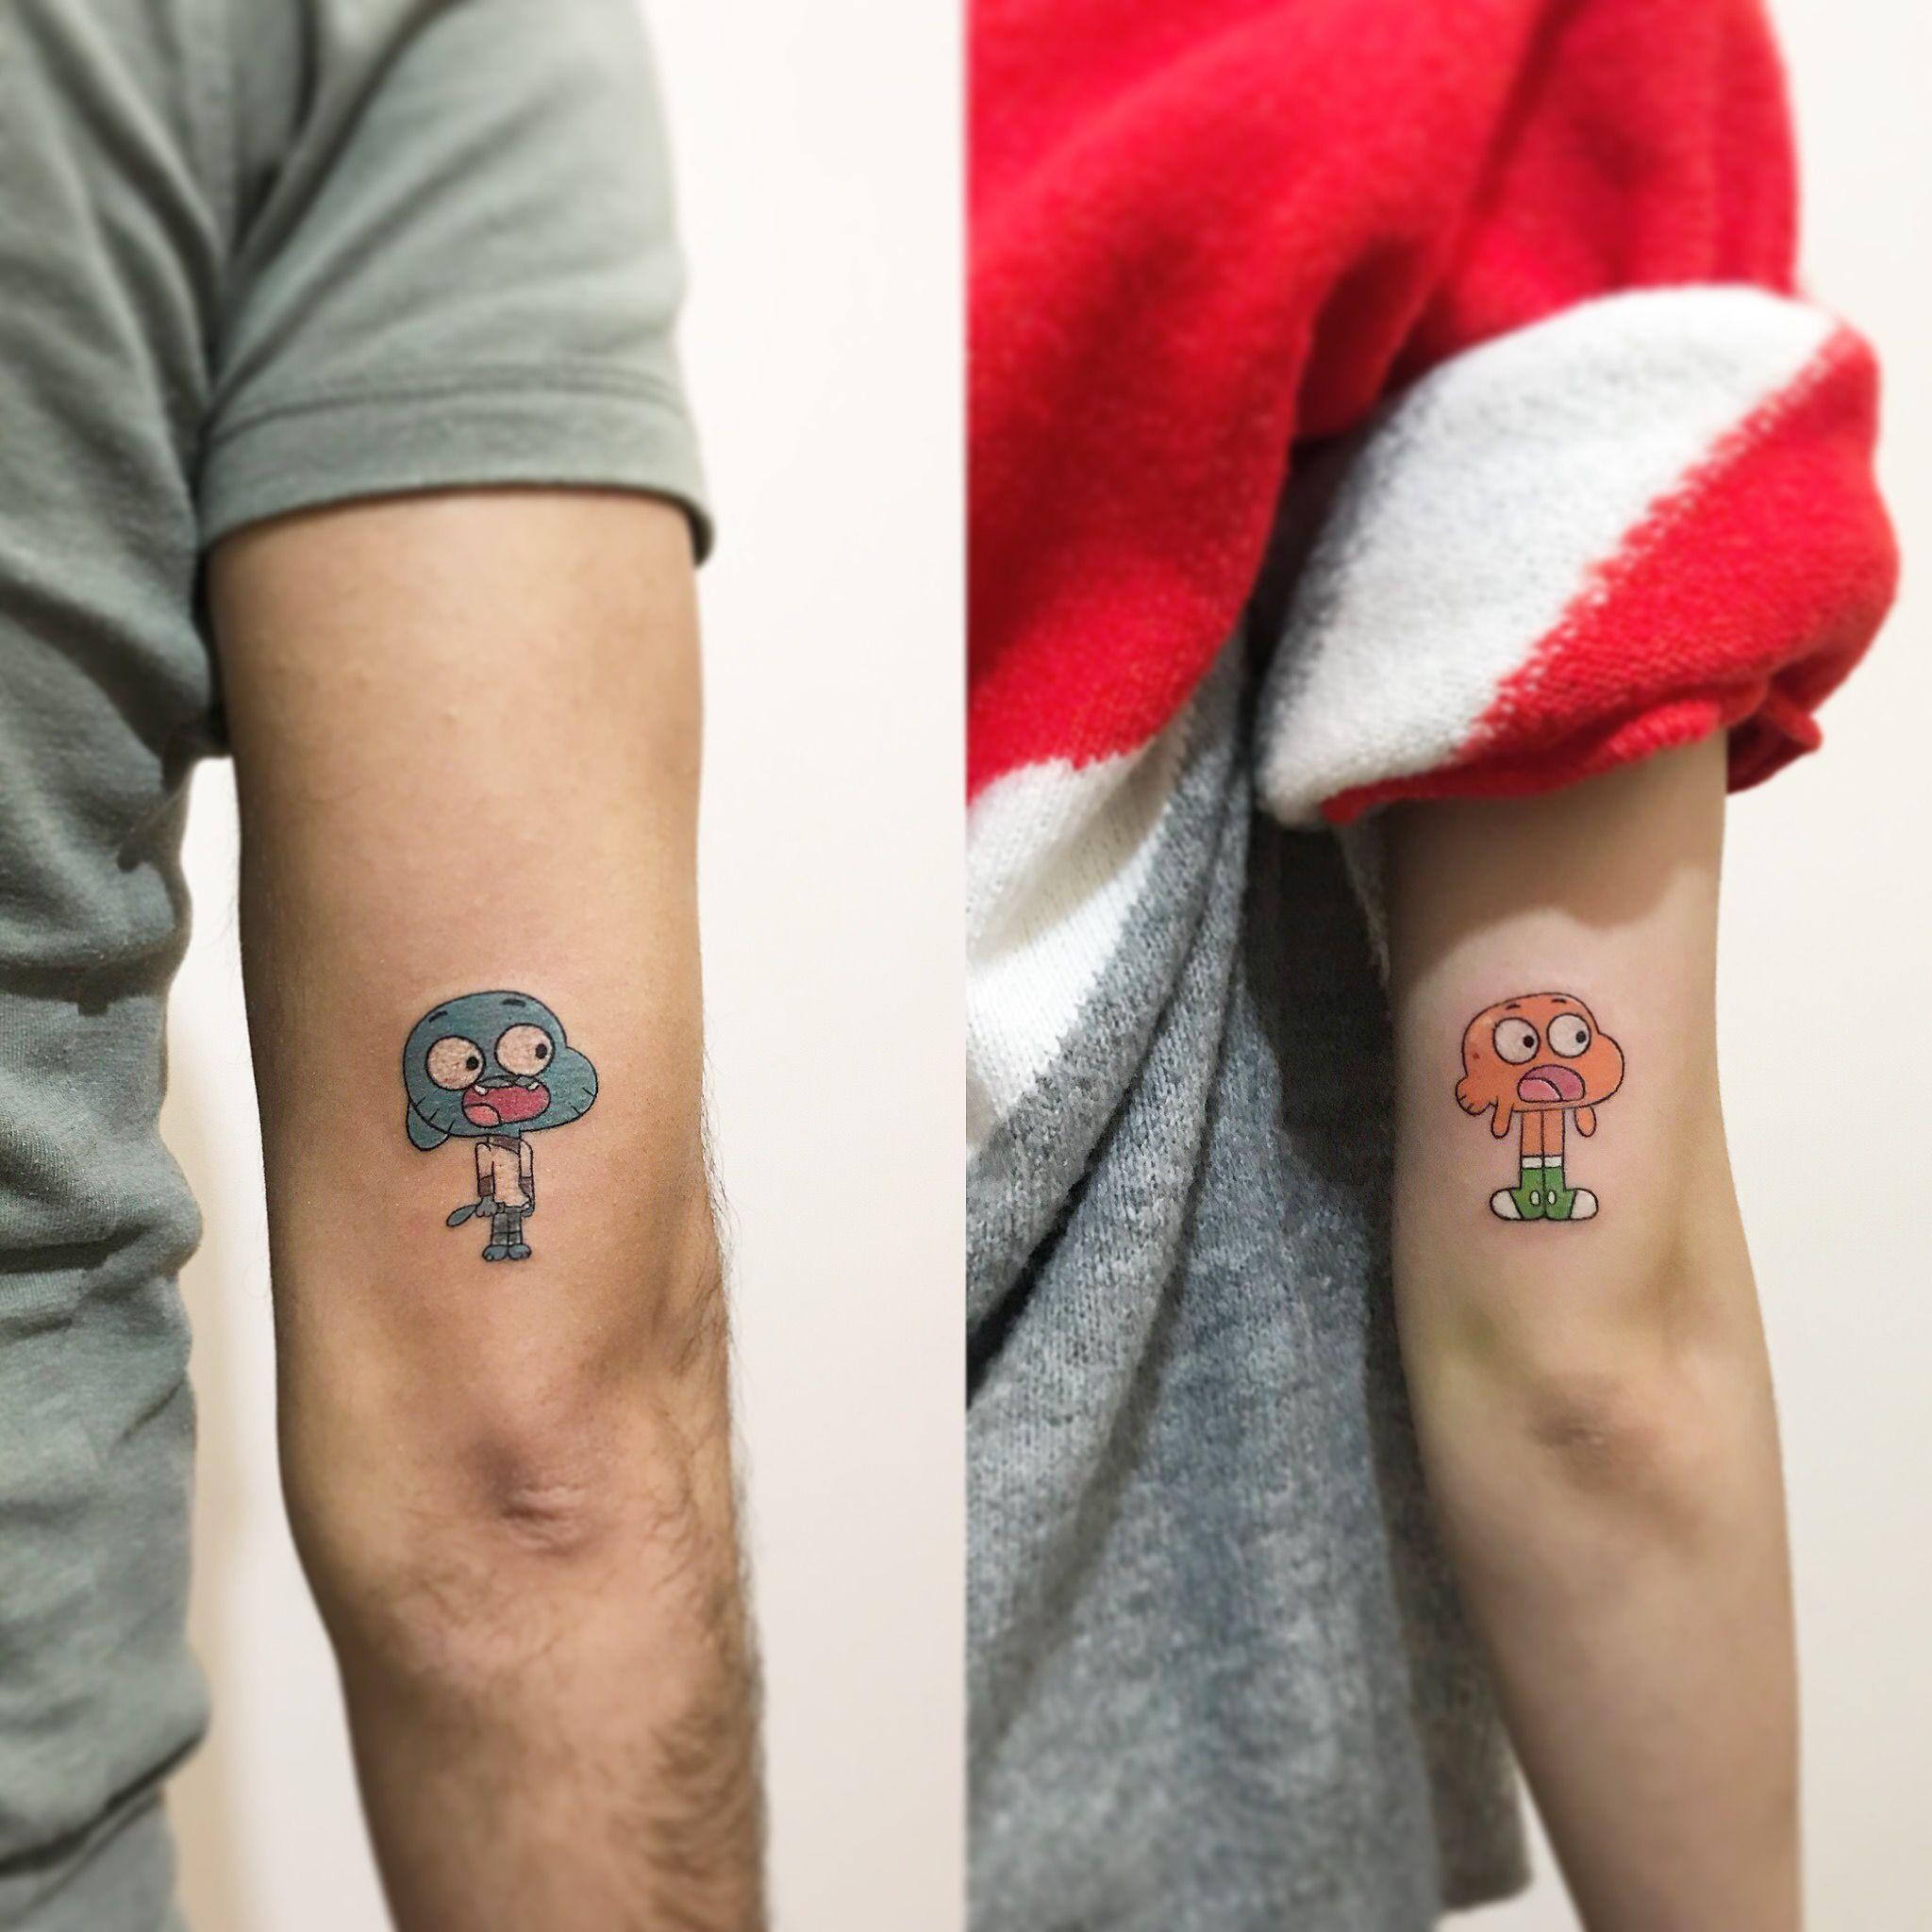 Photo of Gumball tattoo #gumballtattoo